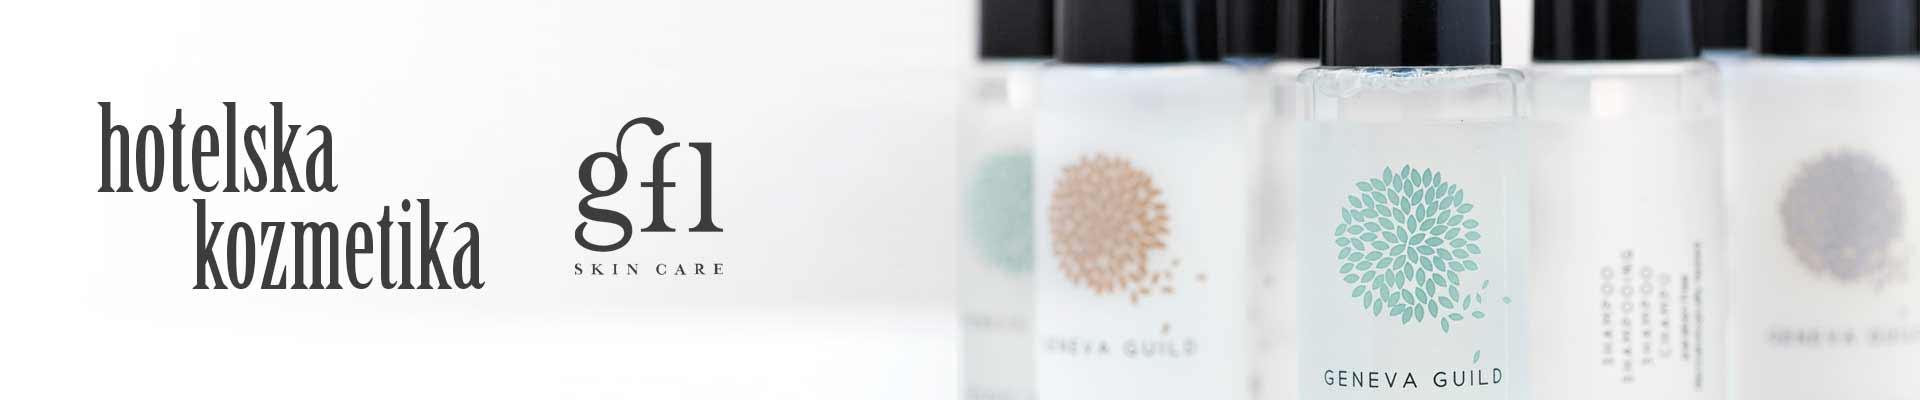 Gfl - hotelska kozmetika